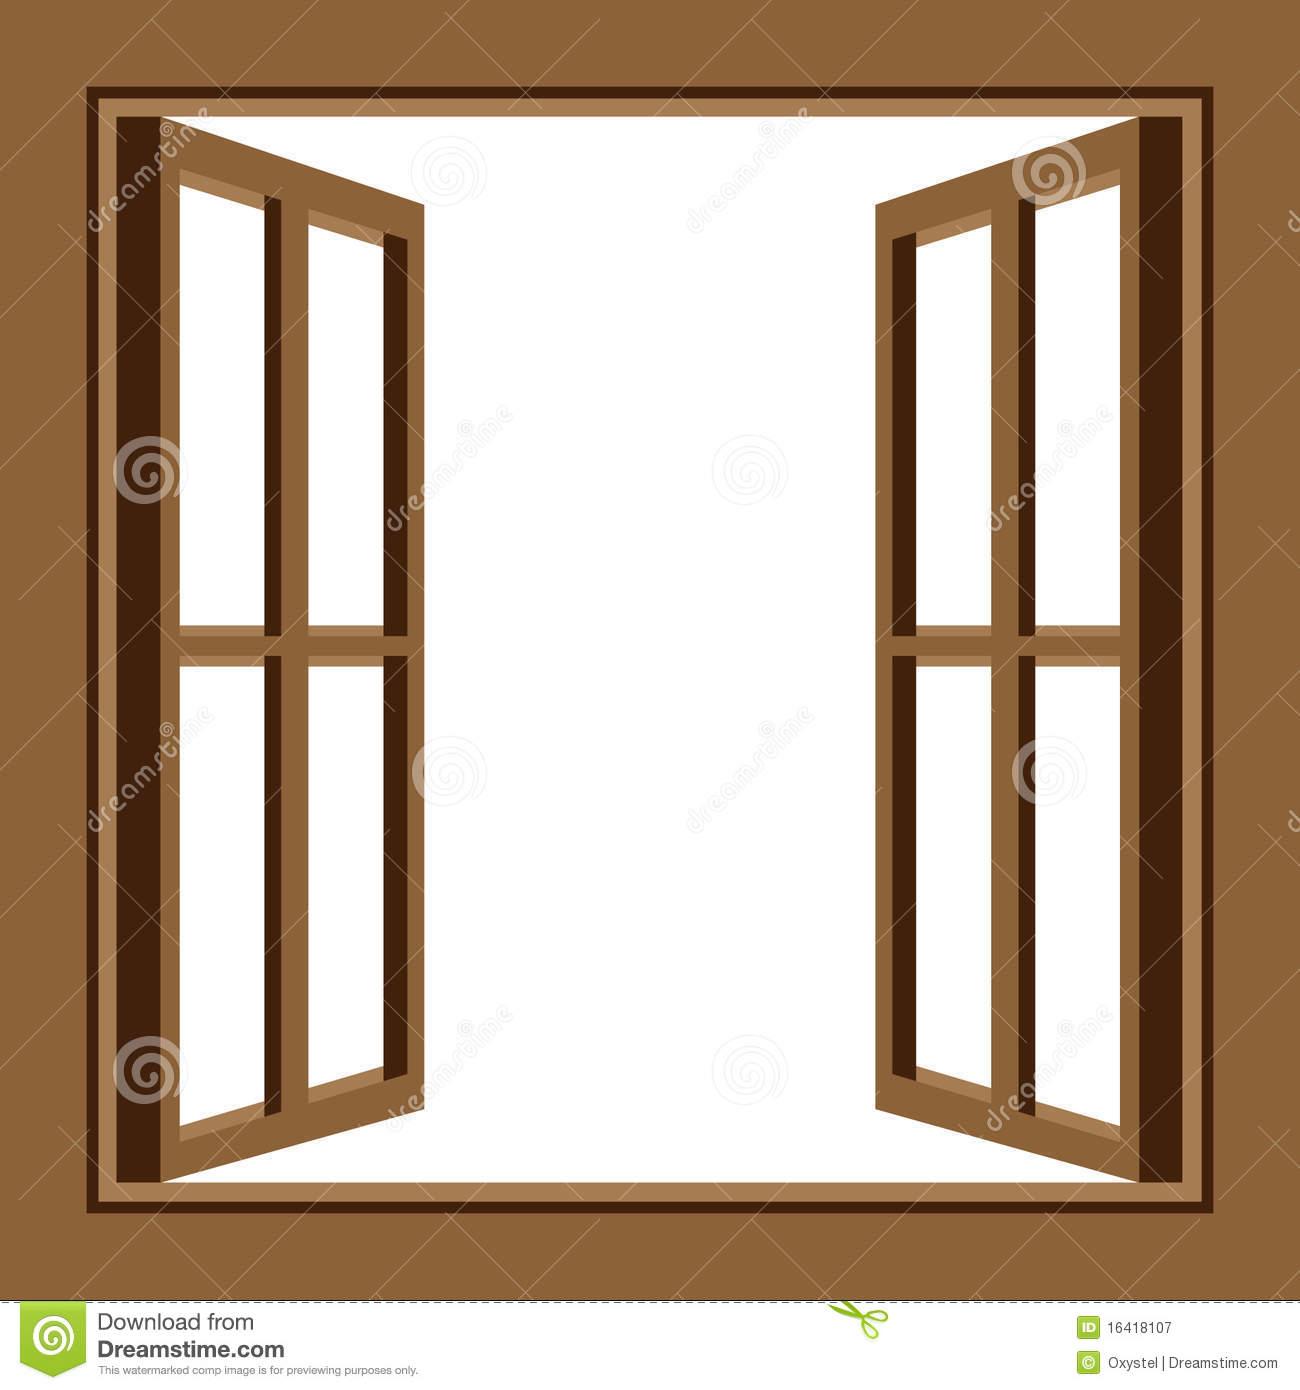 Clip Art. Window Clipart. Stonetire Free Clip Art Images.